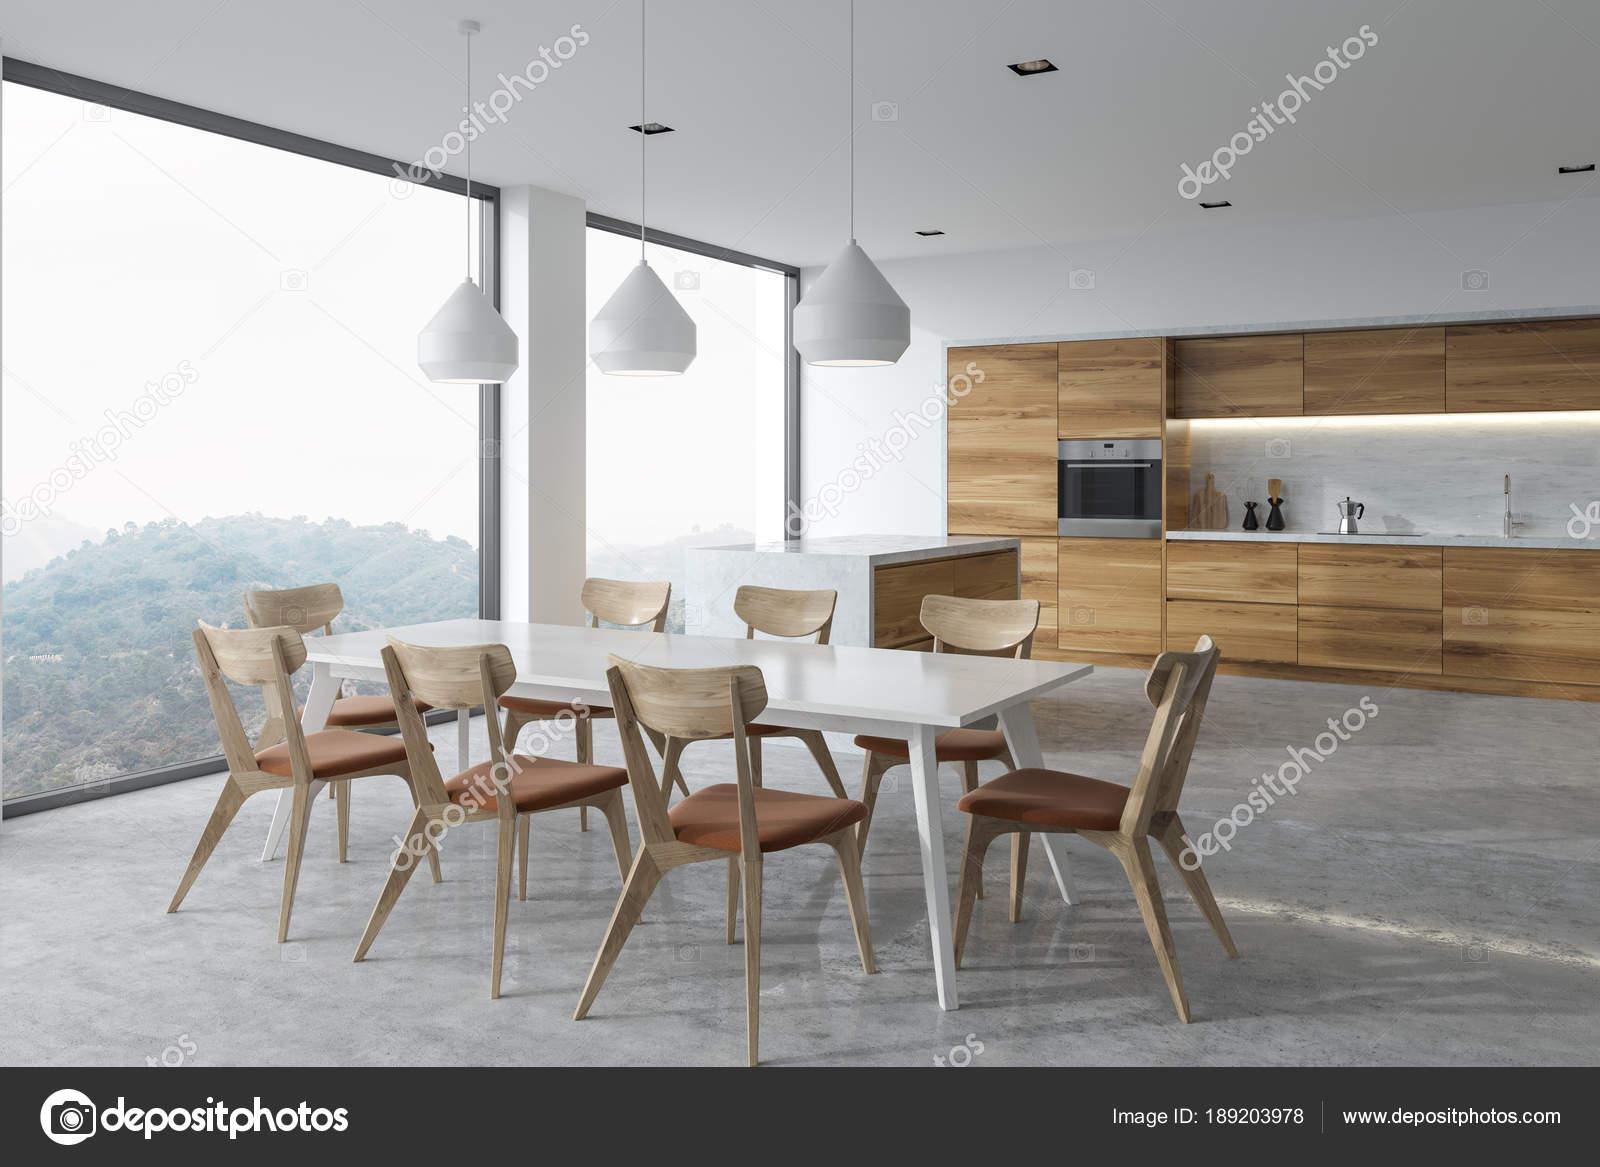 corner booth seating kitchen light oak cabinets 全景厨房角落 白色桌 图库照片 c denisismagilov 189203978 全景厨房角落与混凝土地板 木台面下的原始灯 一张有木椅的桌子 3d 渲染模拟 照片作者denisismagilov